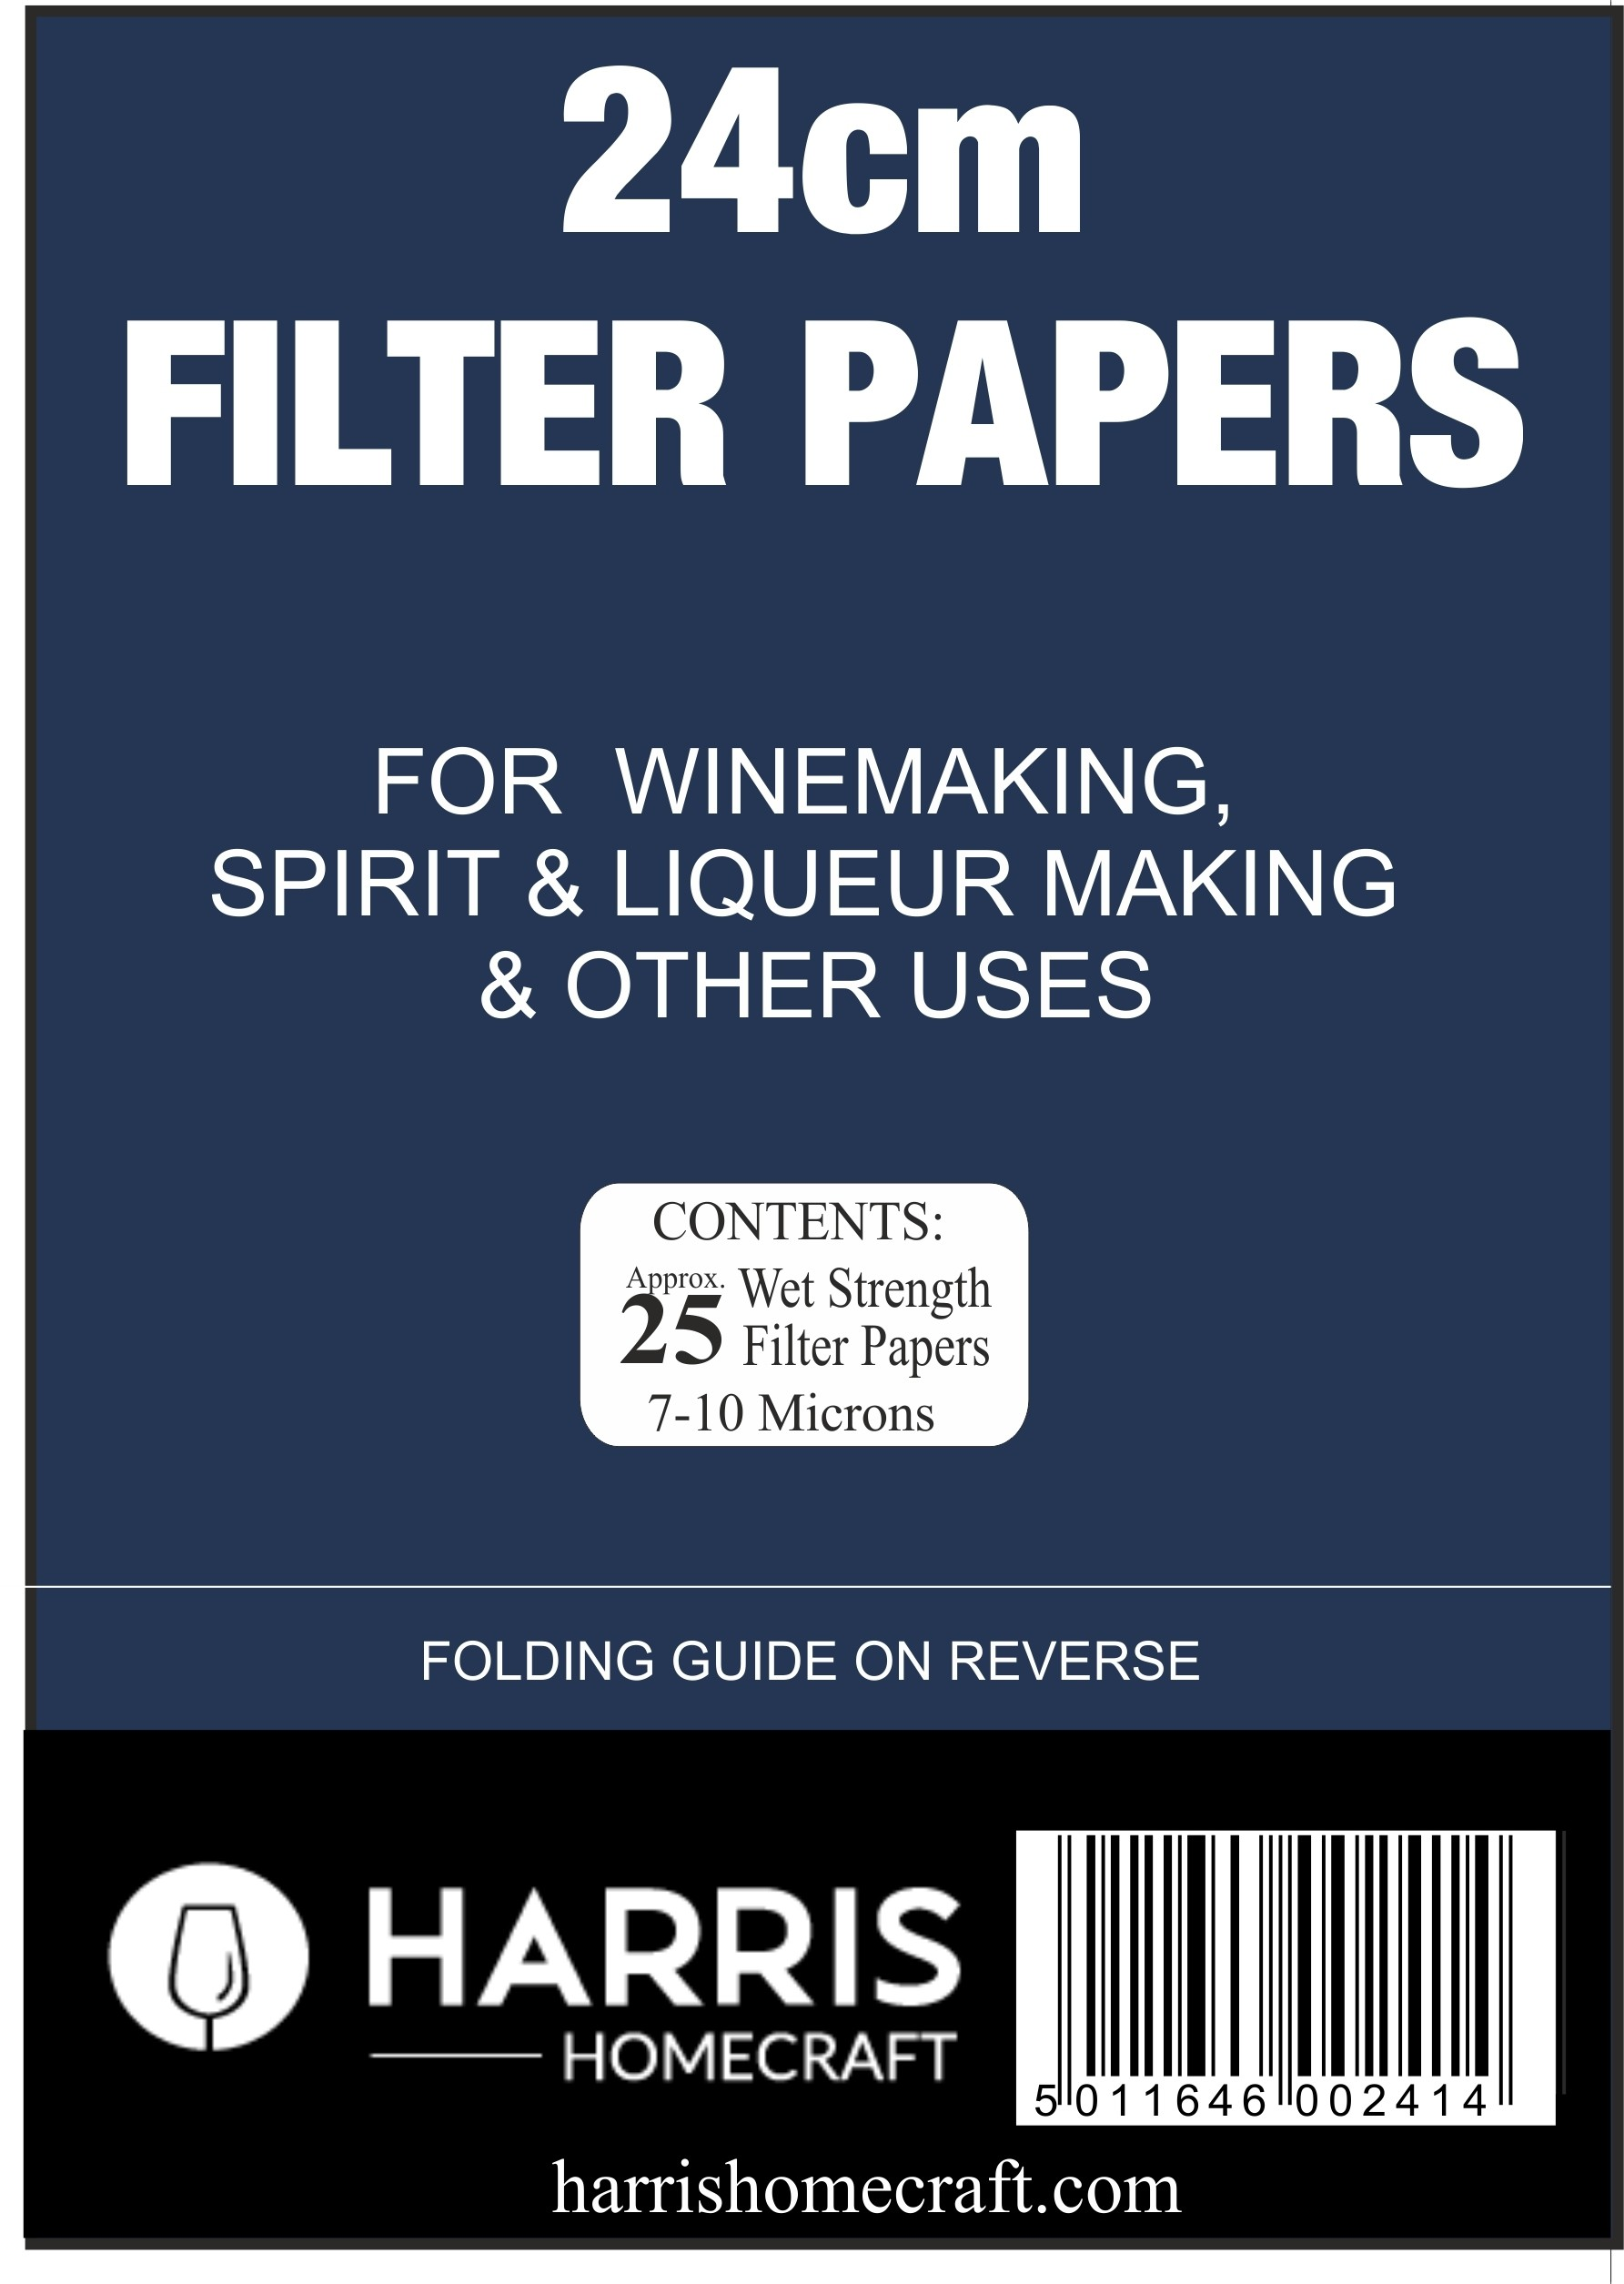 Harris 24cm Vinpapers (Filter Papers)